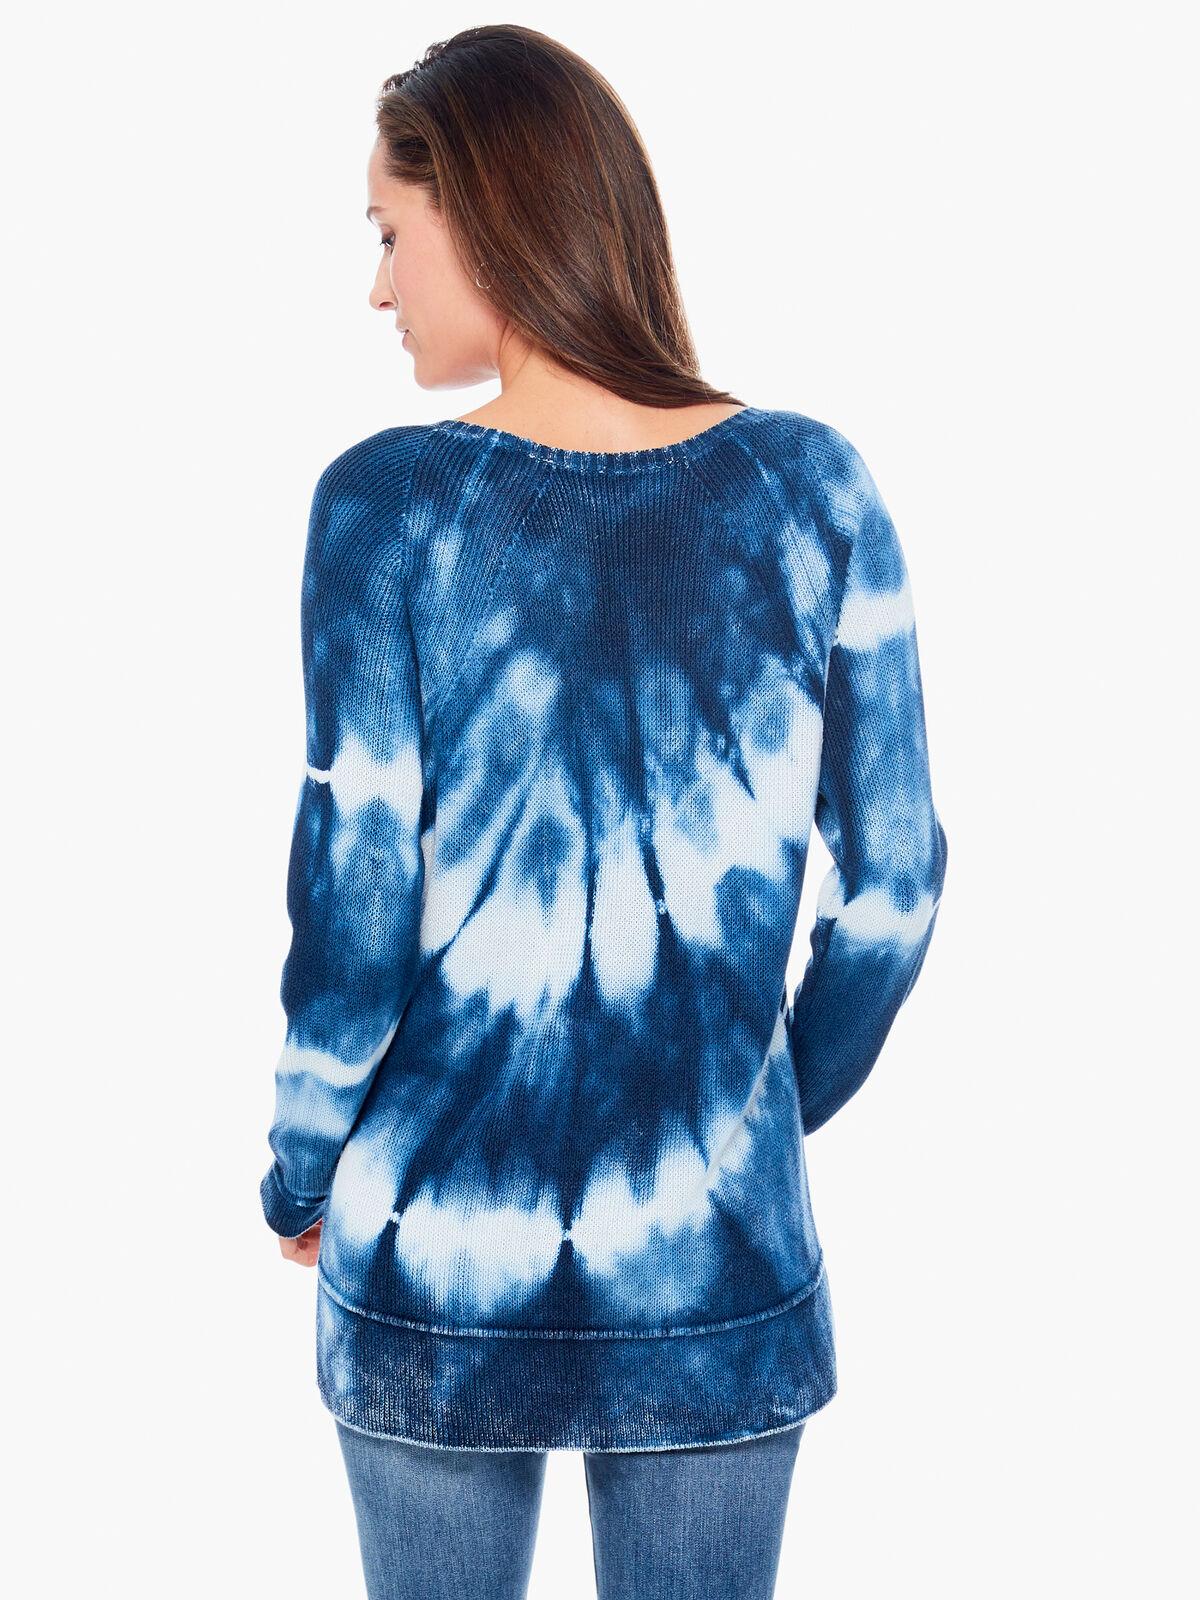 Braided Dreams Sweater